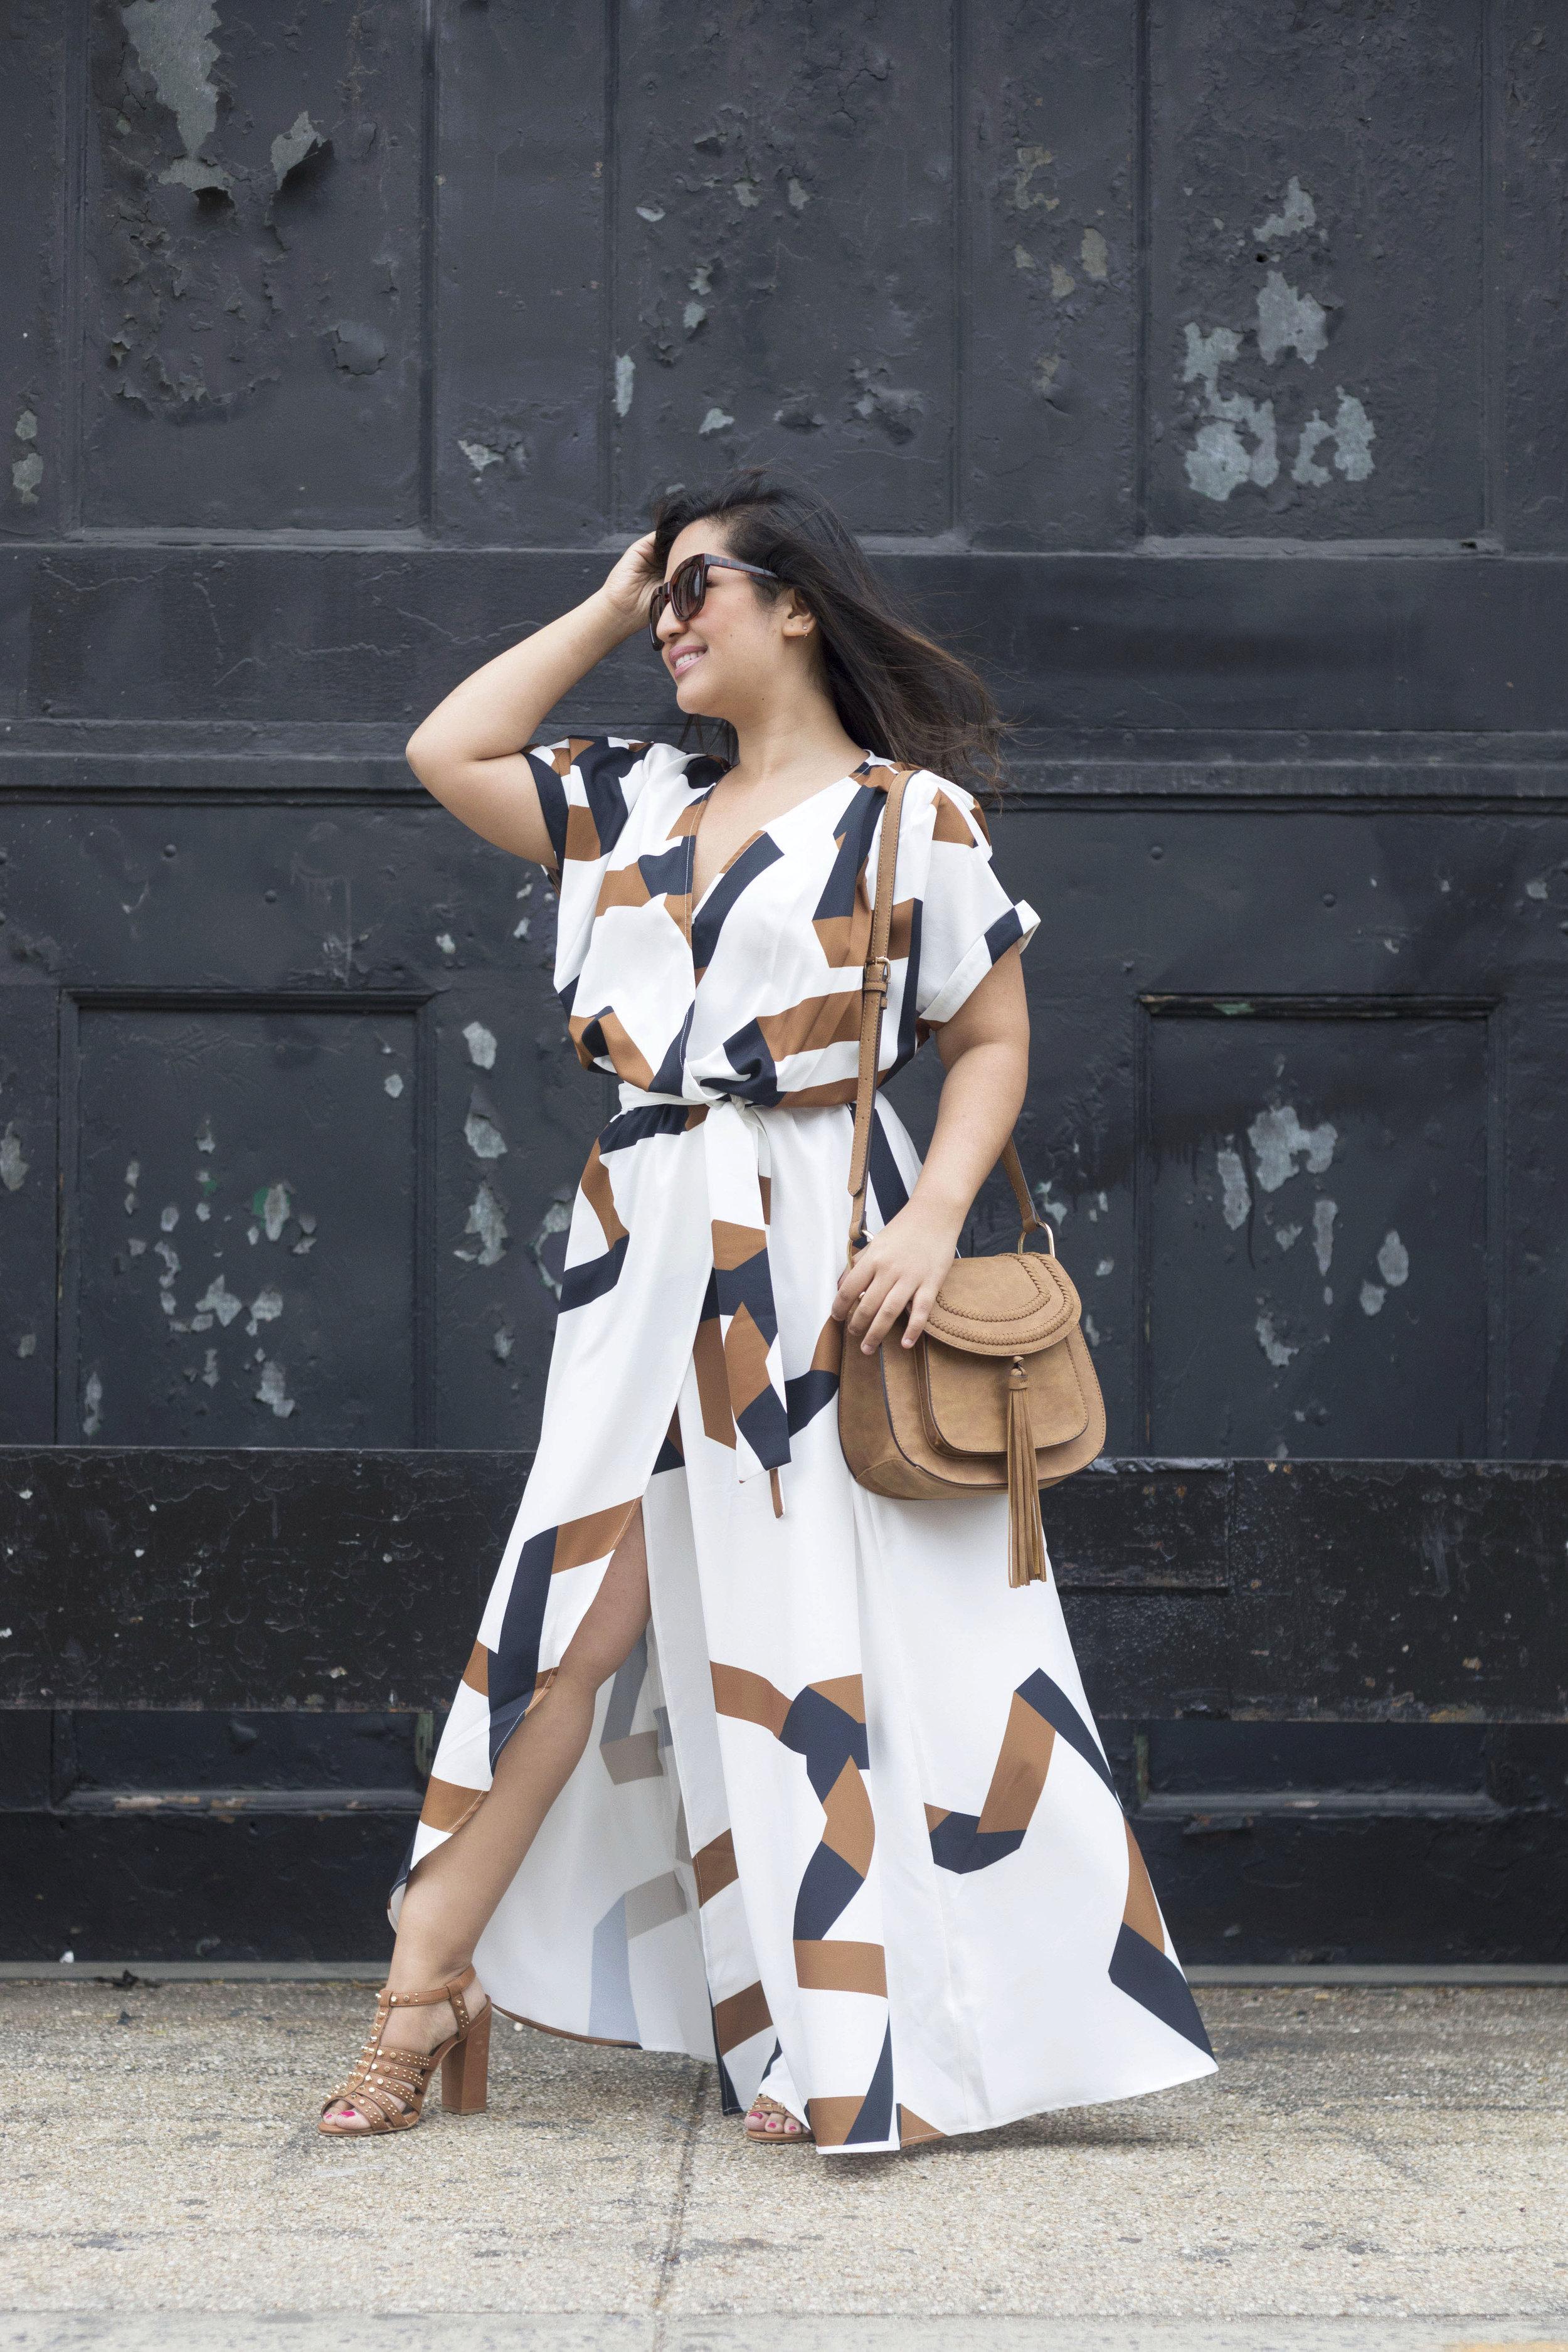 Krity S x SheIn x Maxi Dress